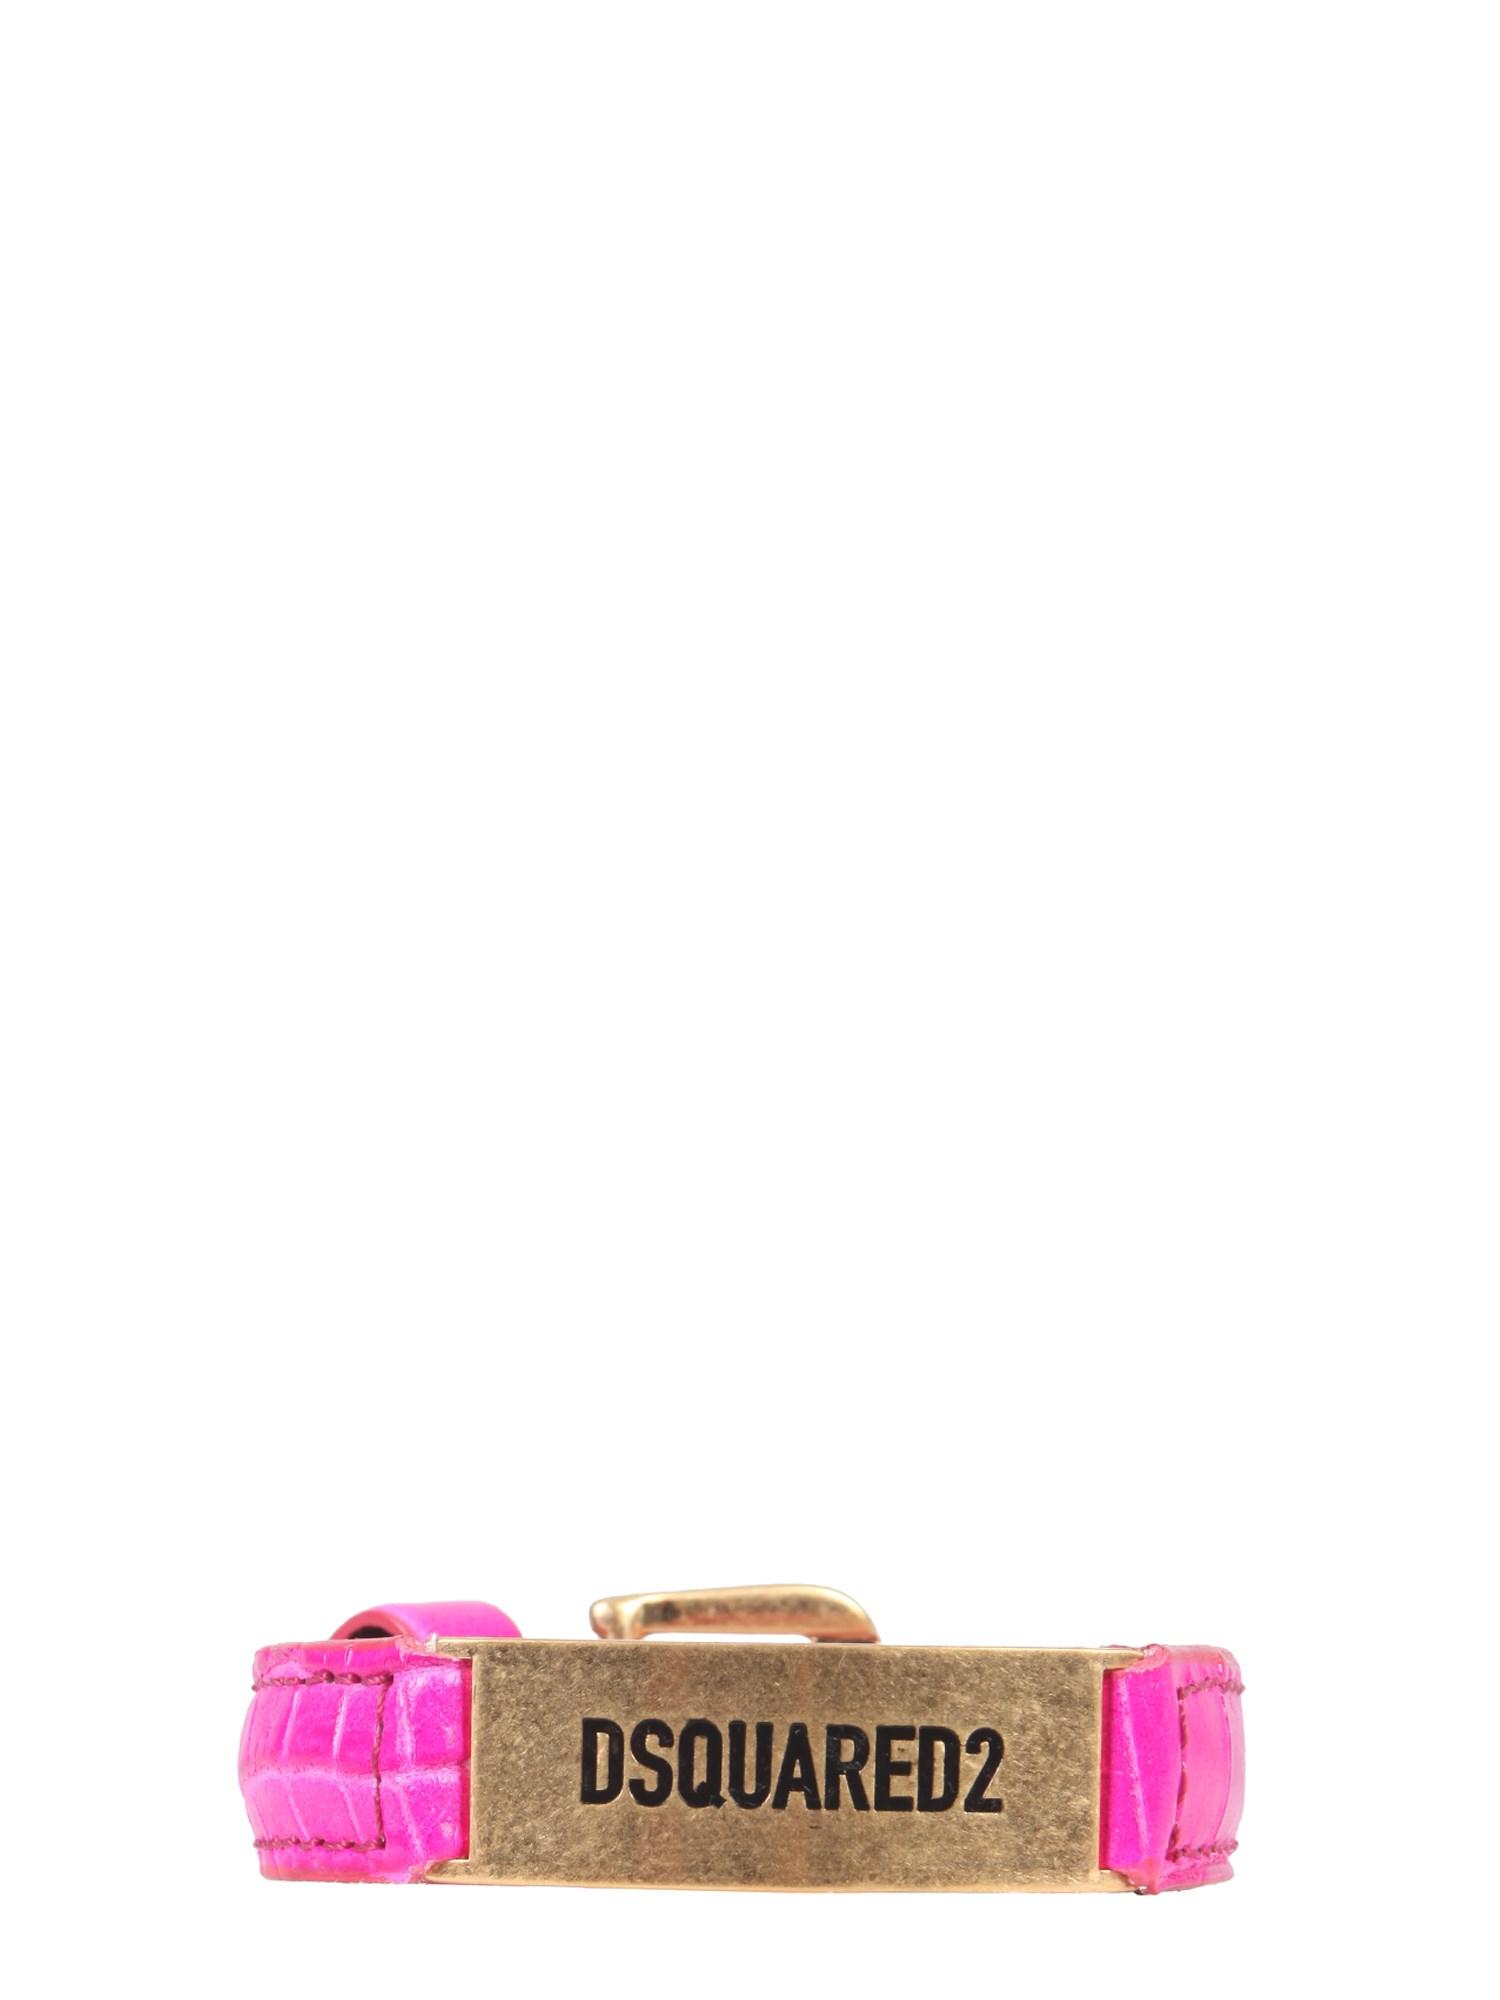 dsquared leather bracelet